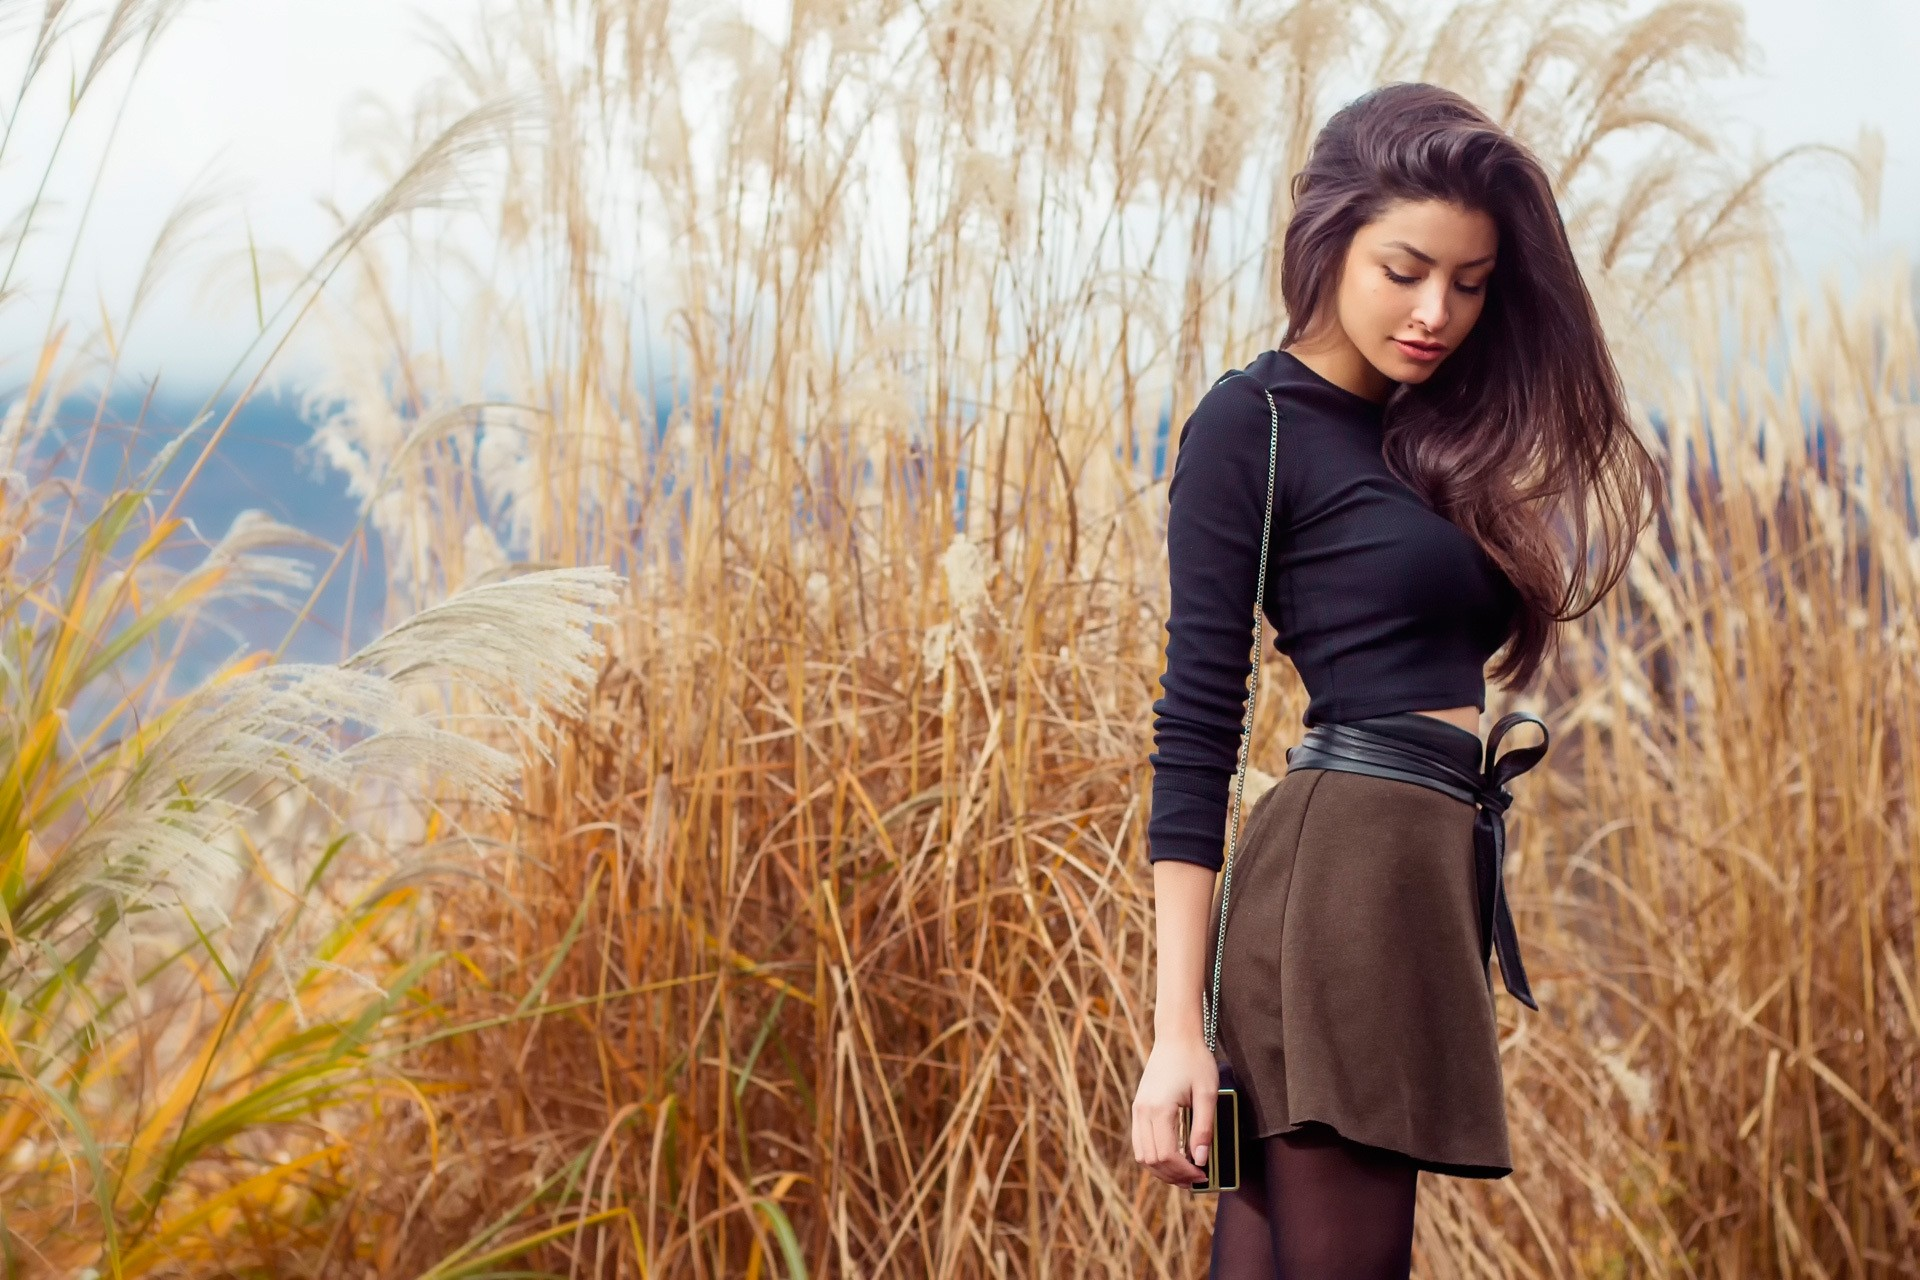 Girl In Skirt Outdoor, Hd Girls, 4k Wallpapers, Images